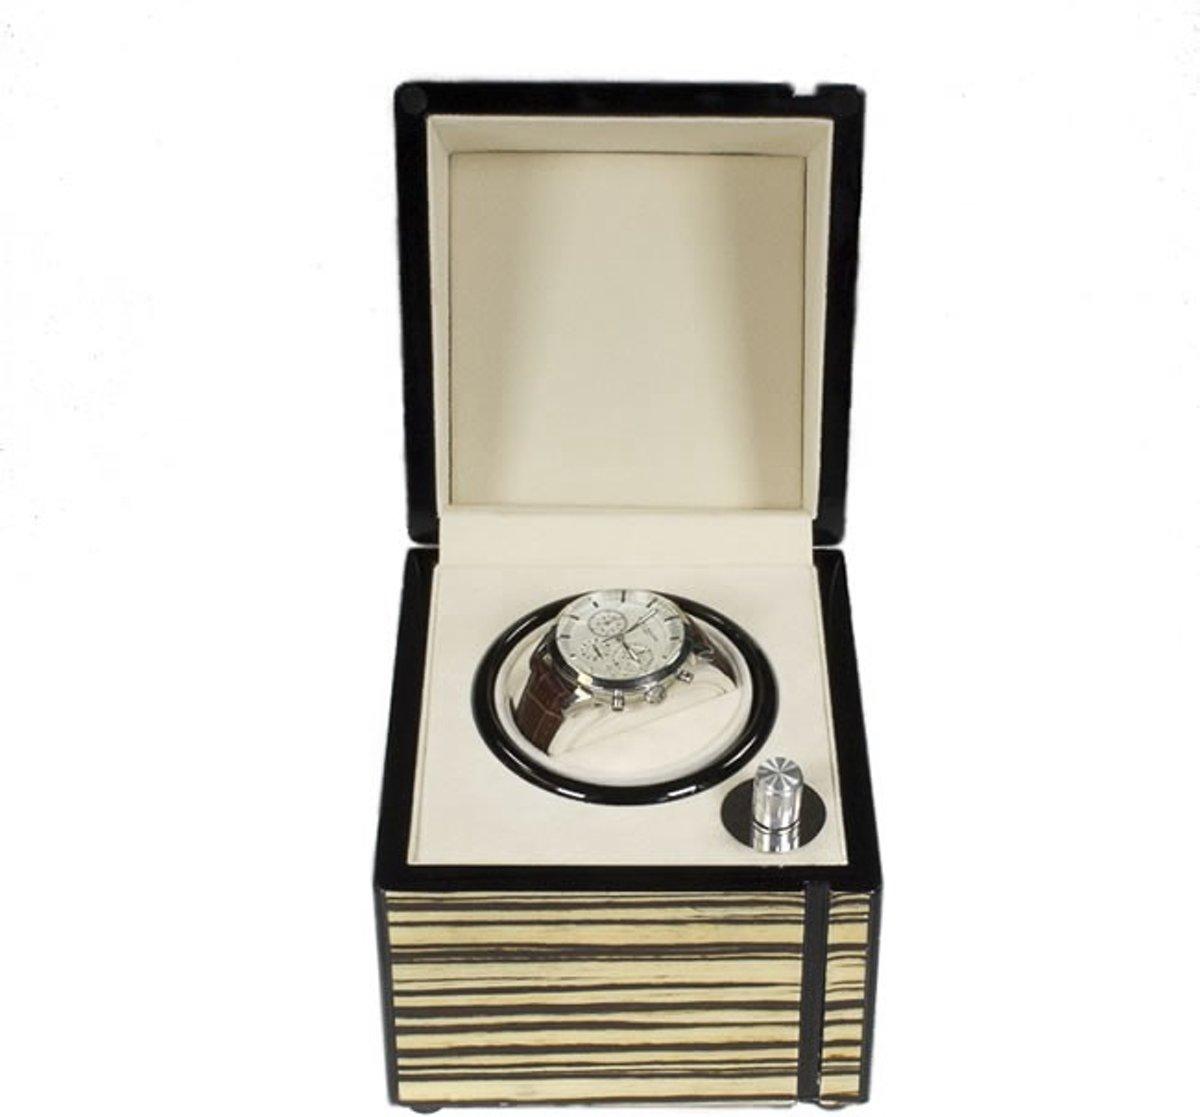 Rosenfelt watchwinder / horloge opwinder - JACK kopen